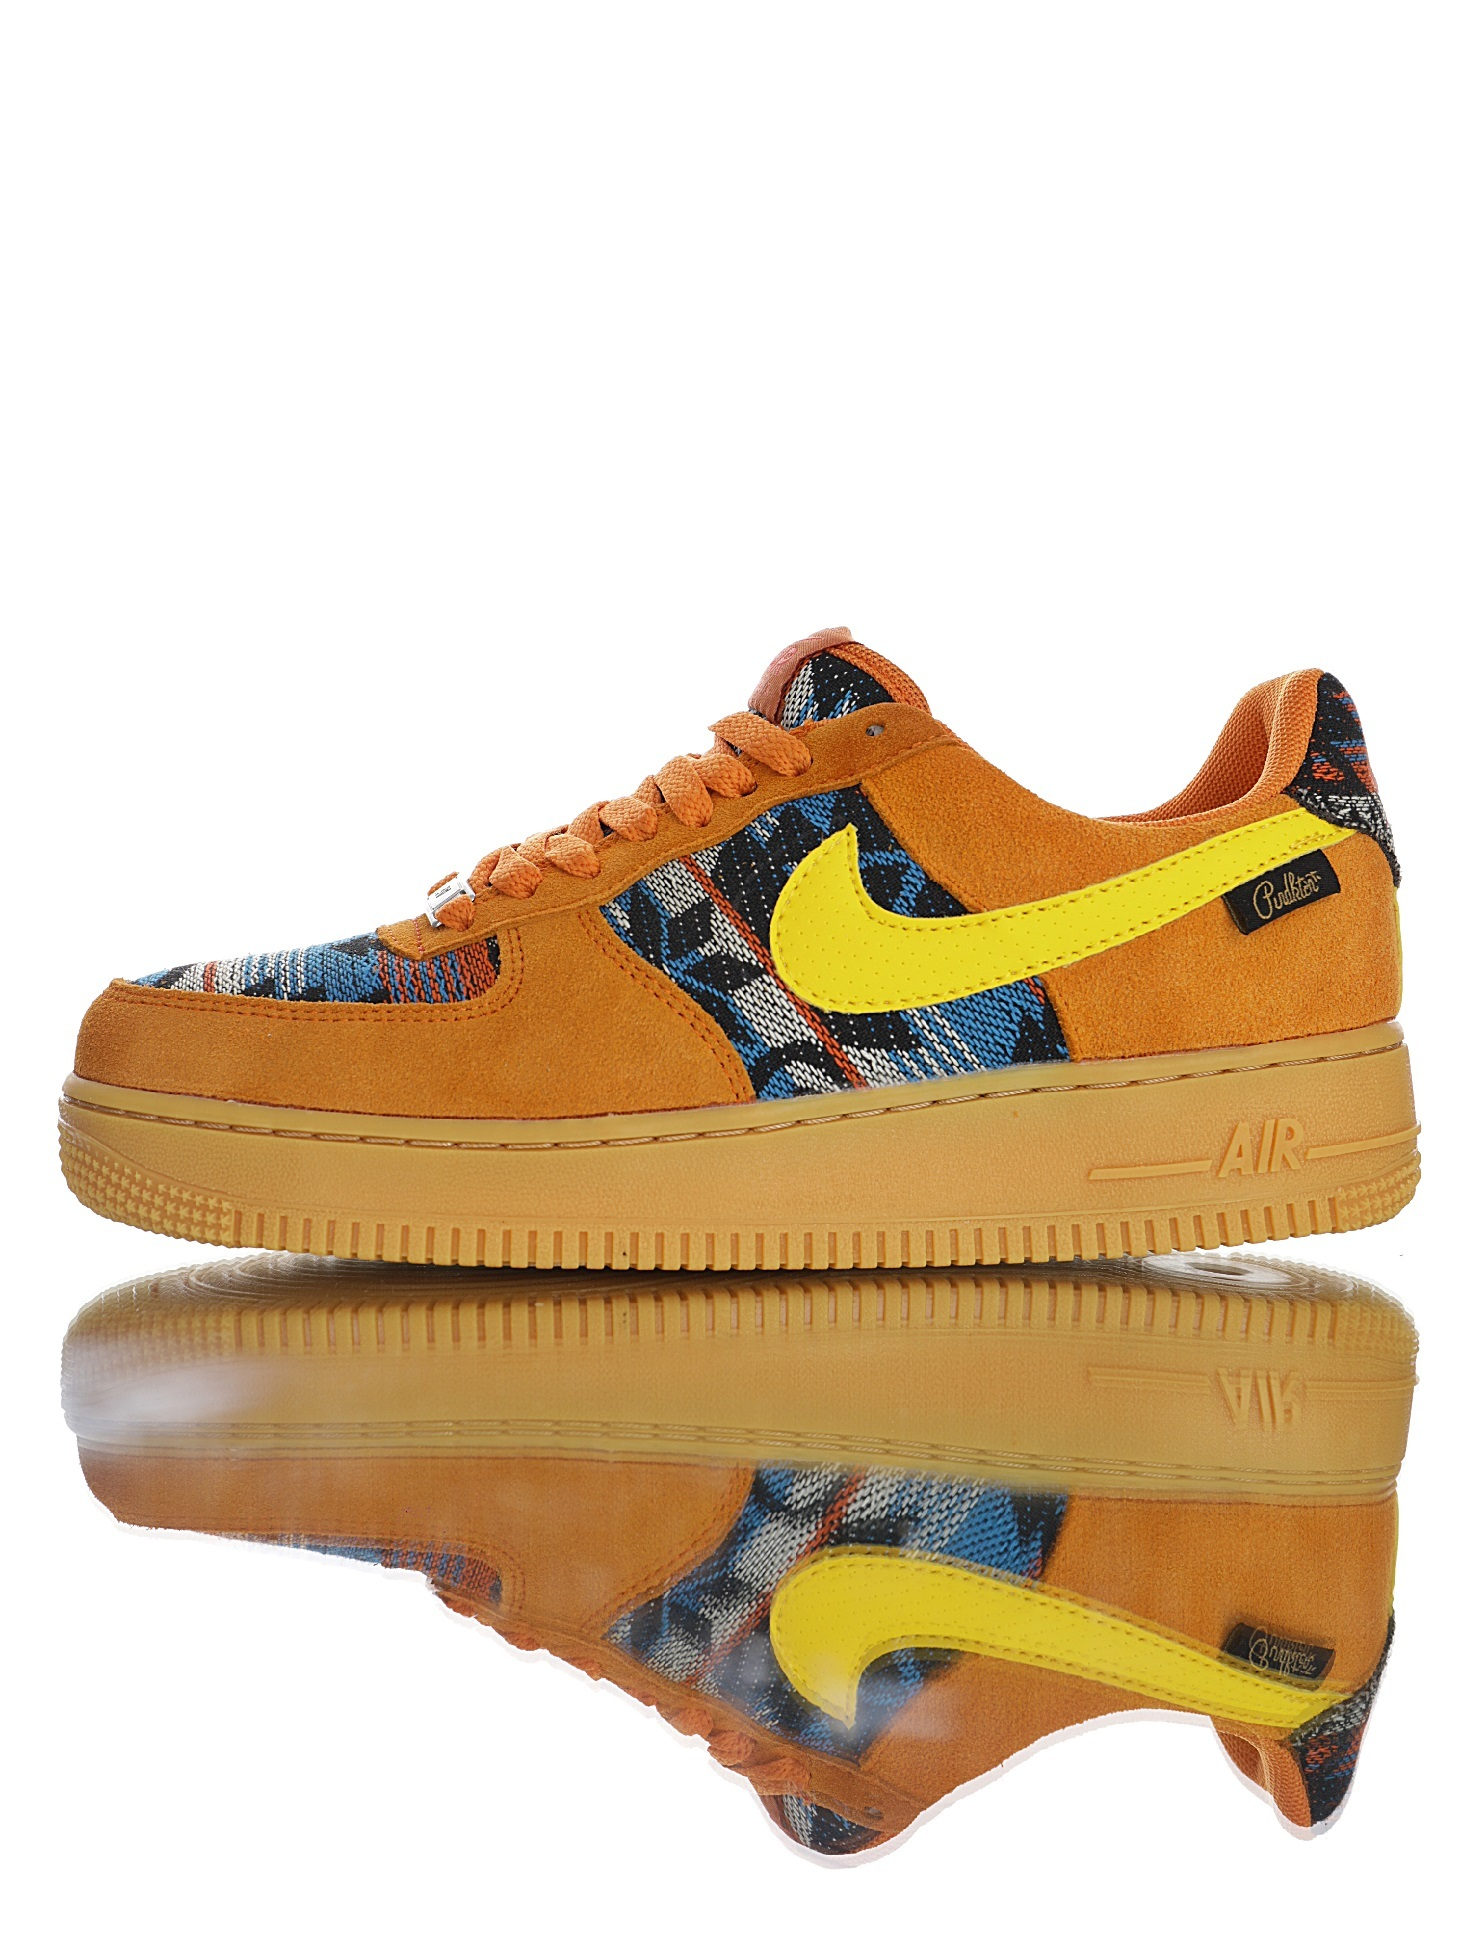 "Nike Air Force 1 '07 LV8″N7 Pendleton"""